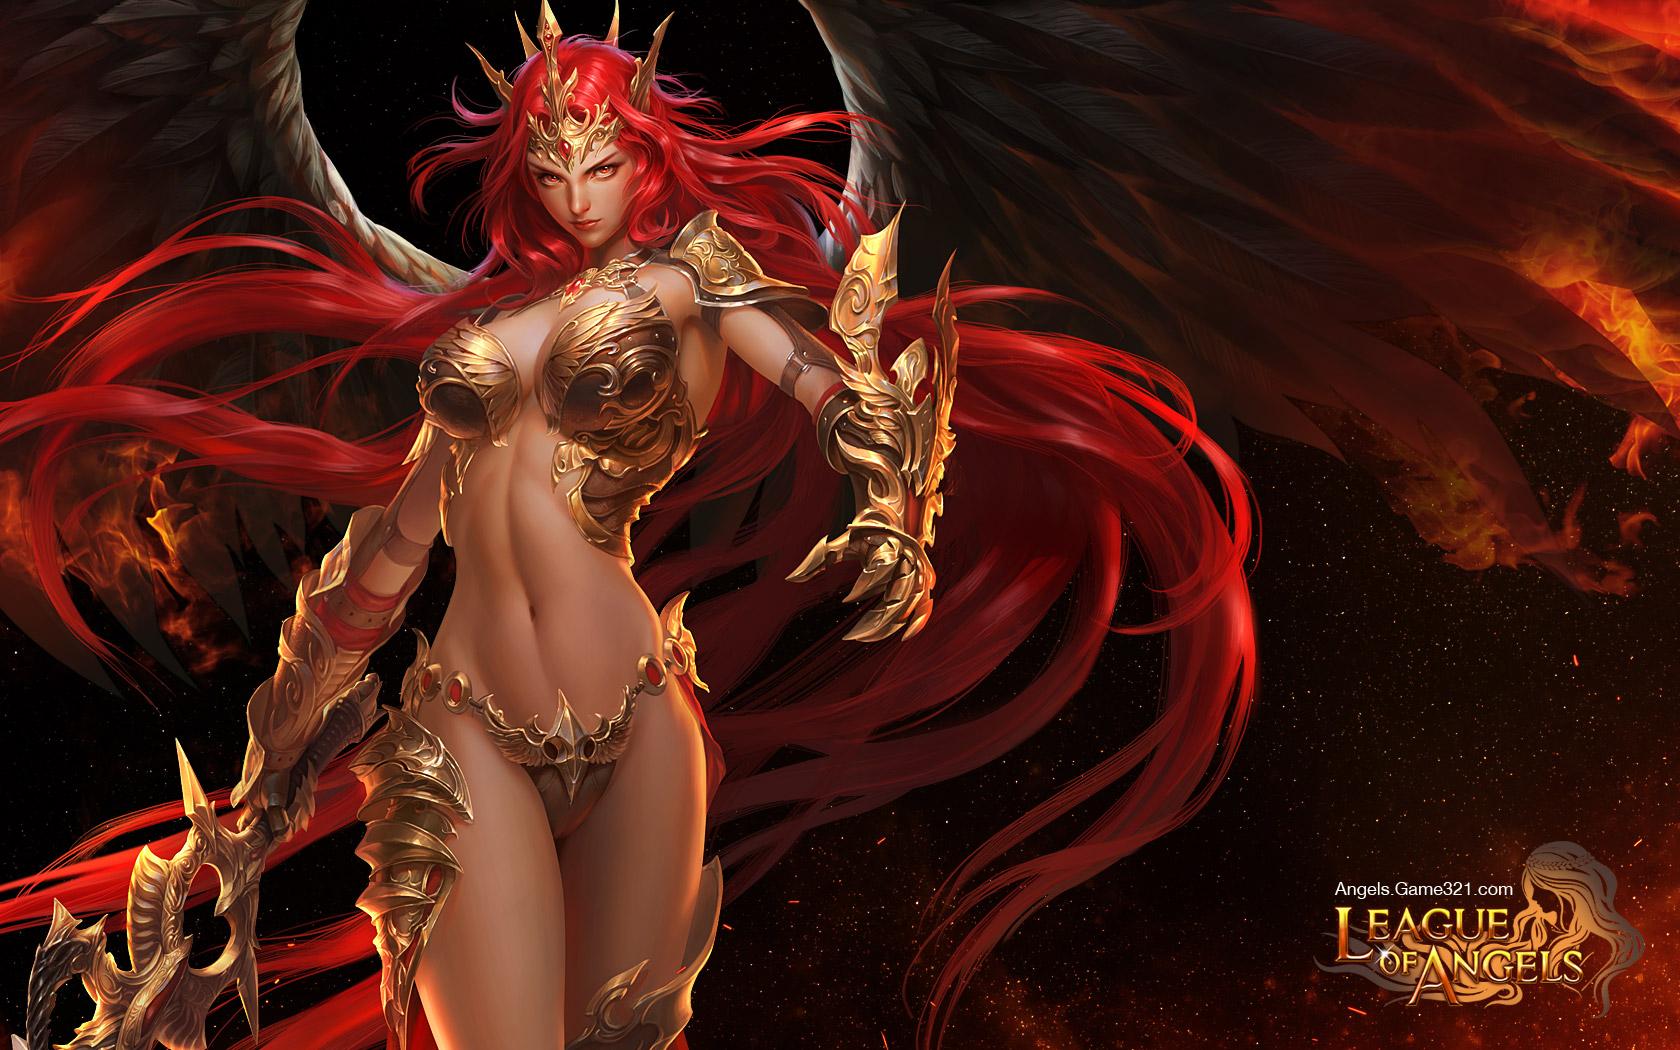 Nude fantisy warrior girls erotic image